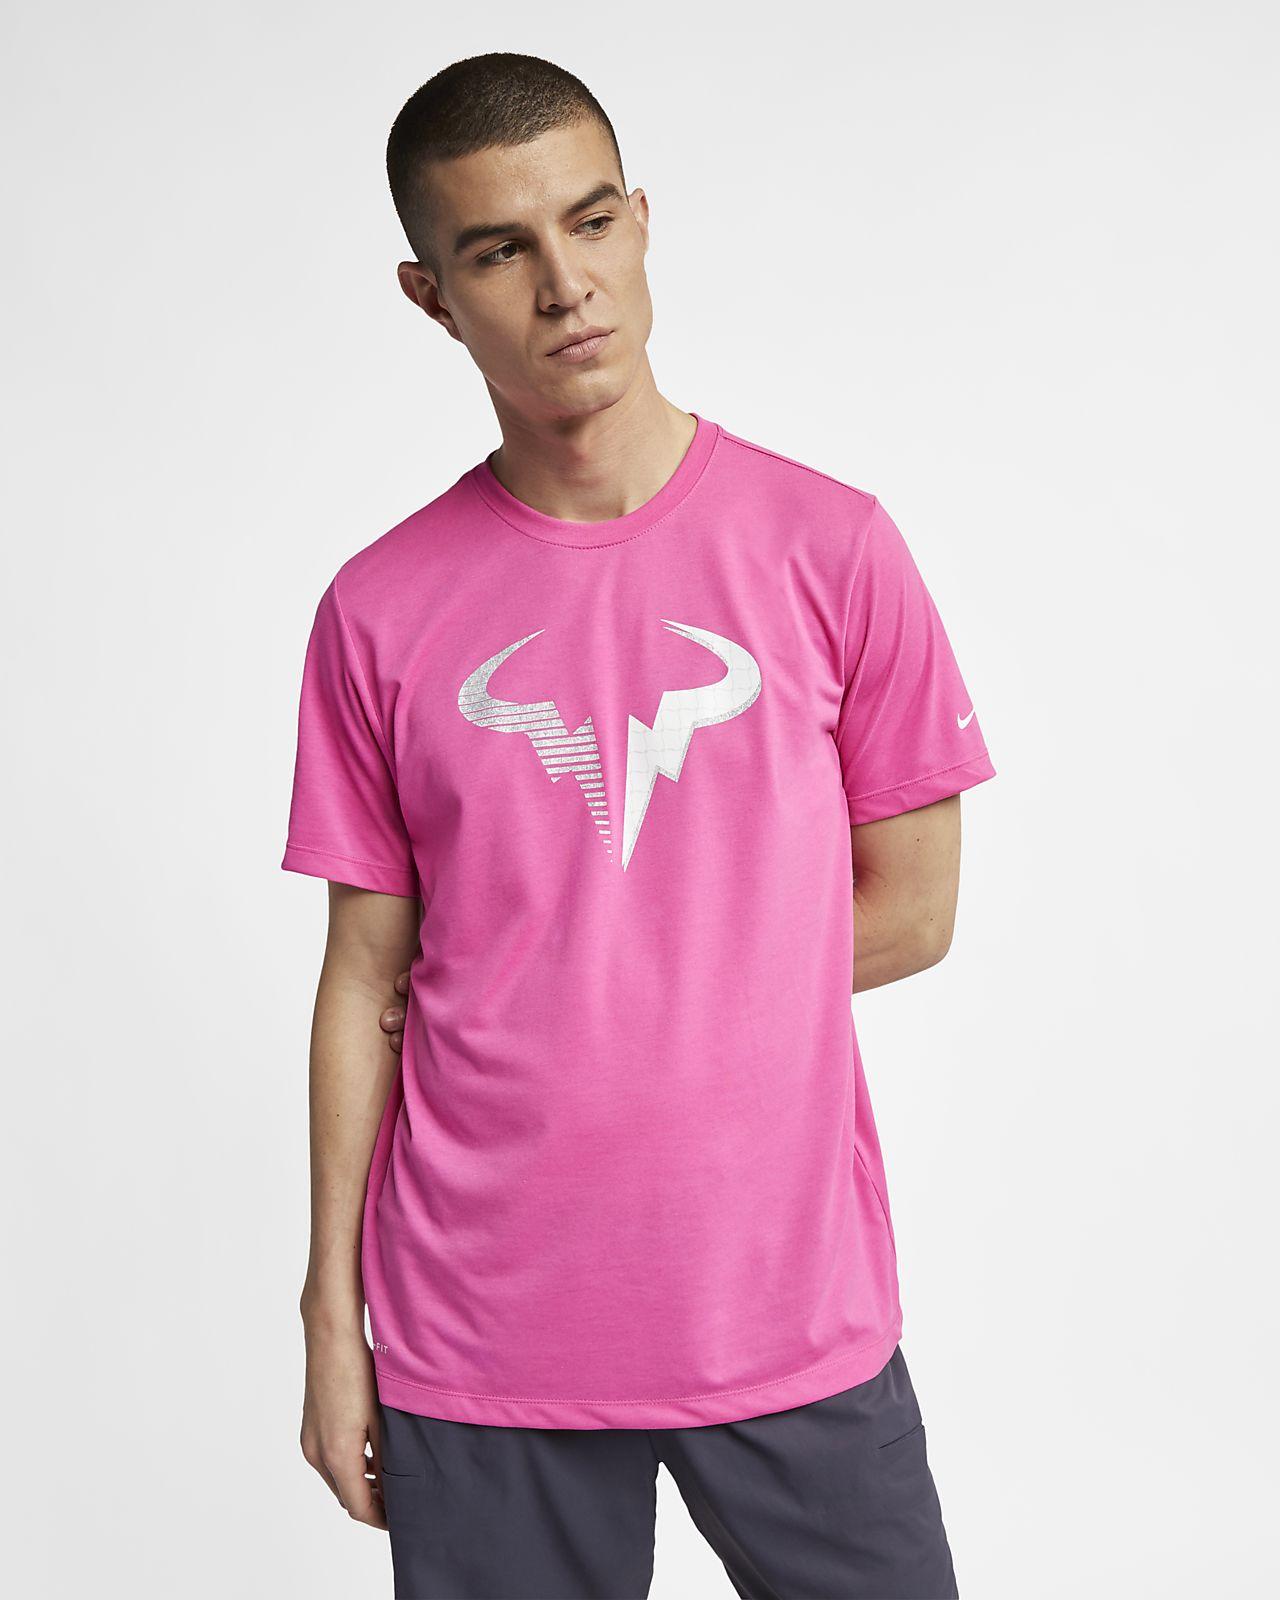 f1150cb061d3 Tee-shirt de tennis NikeCourt Dri-FIT Rafa pour Homme. Nike.com BE